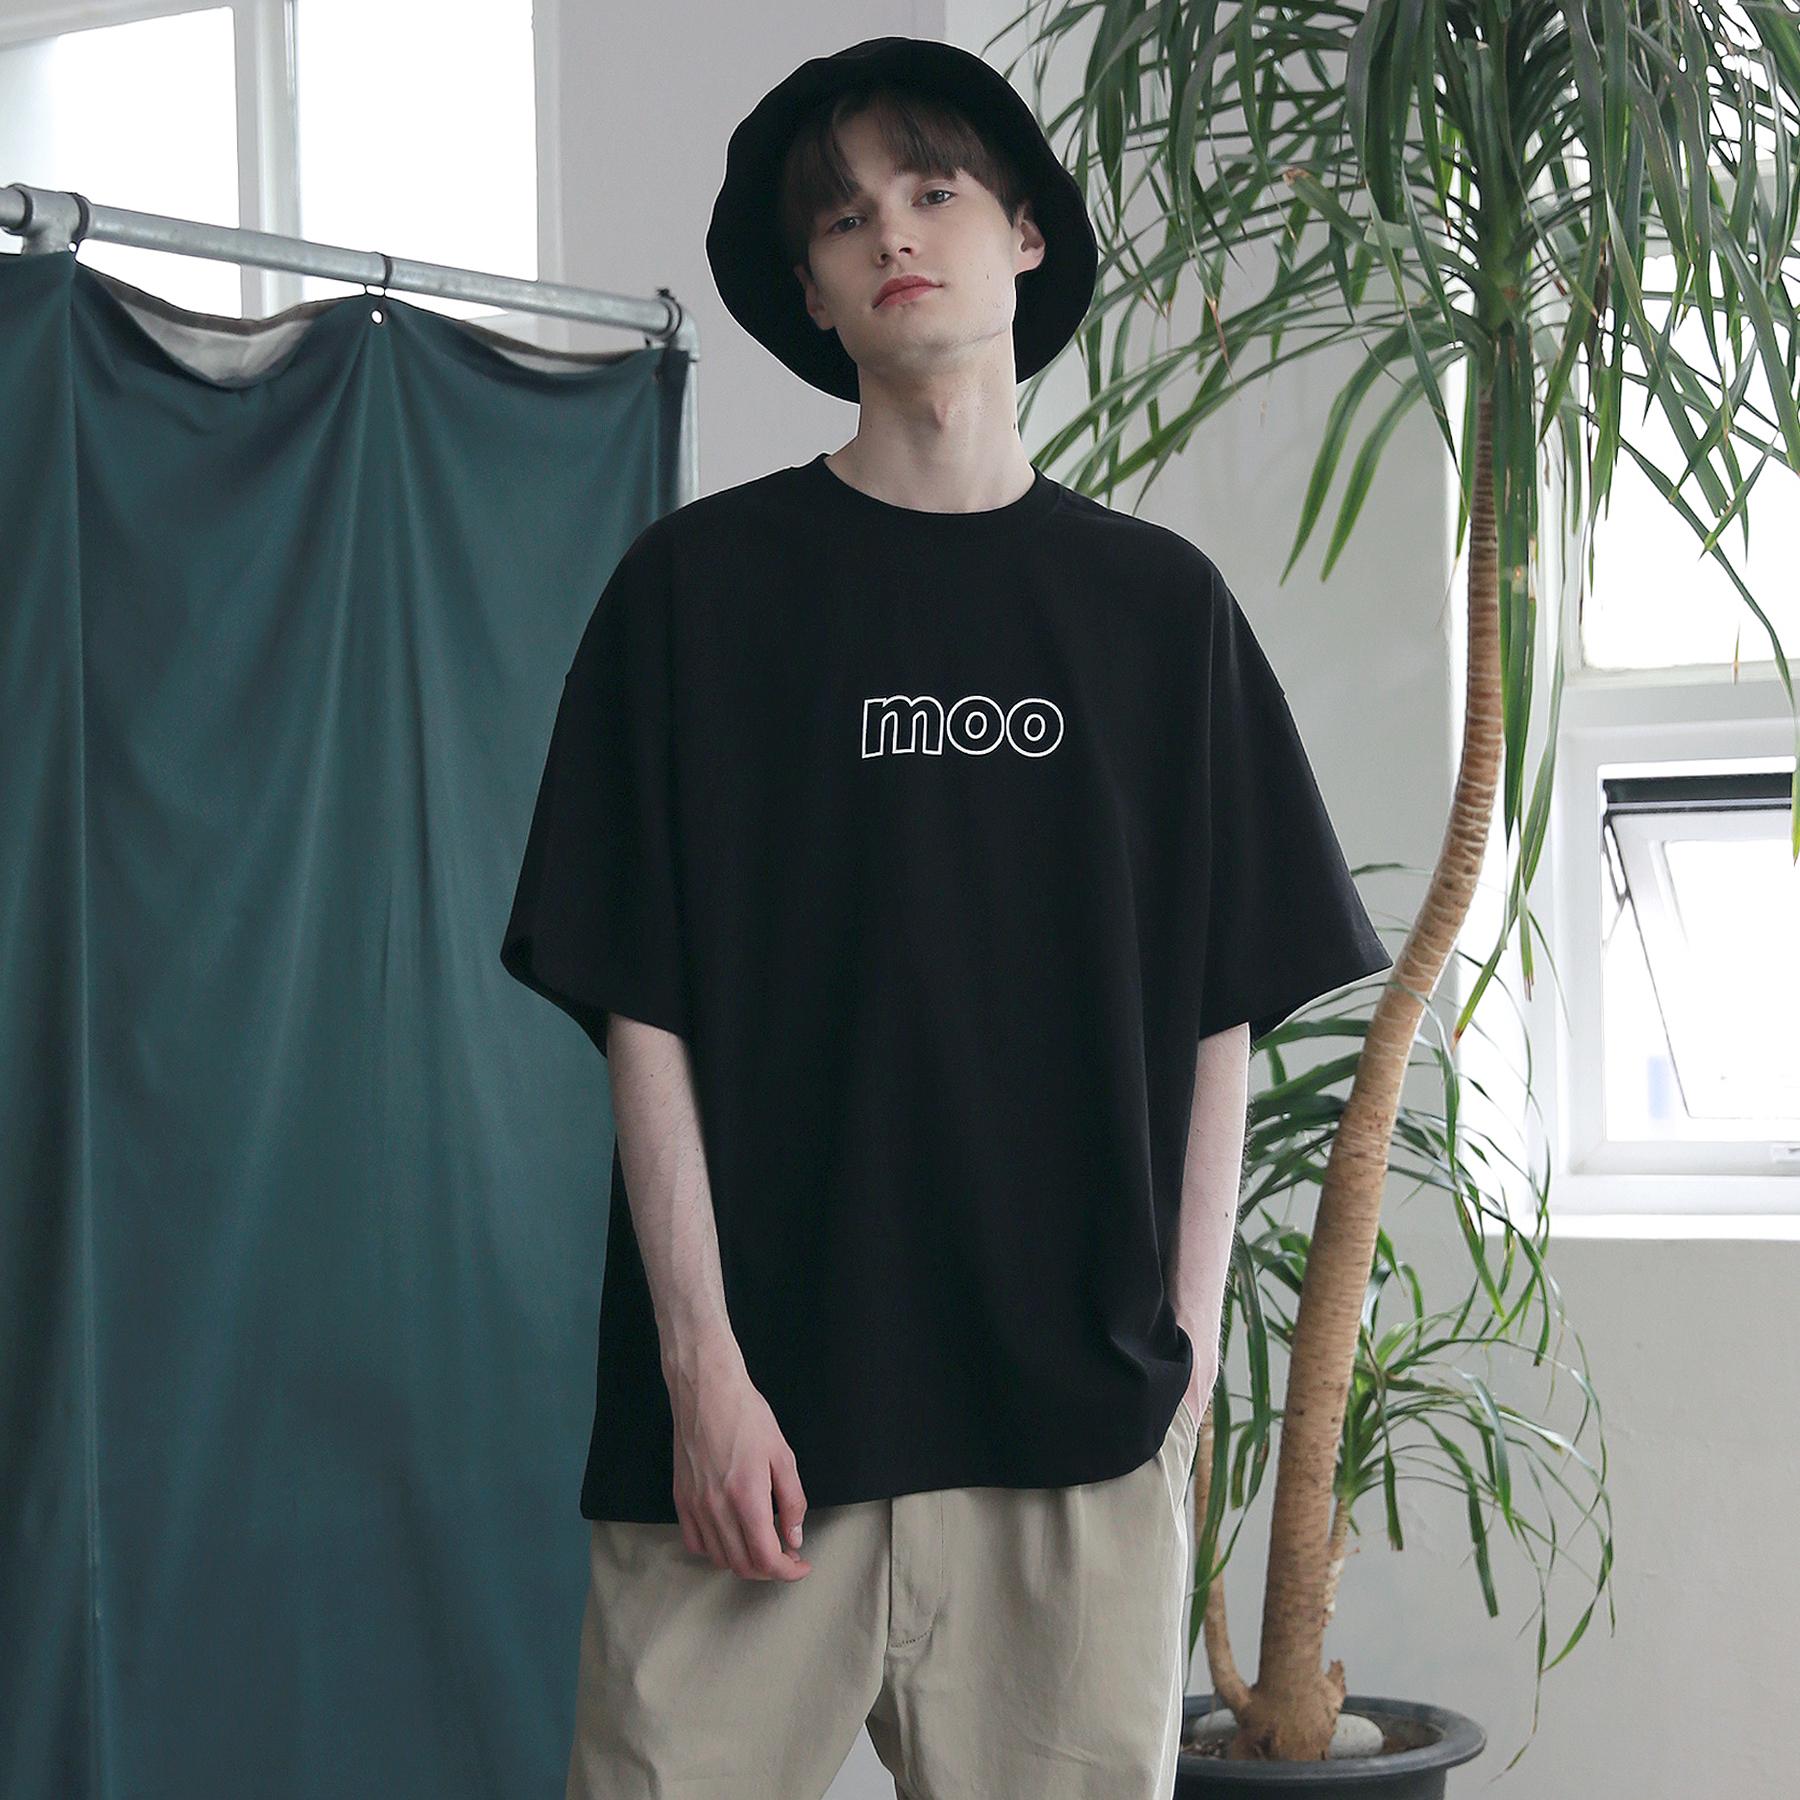 MOO 이니셜로고 오버핏 반팔티 블랙